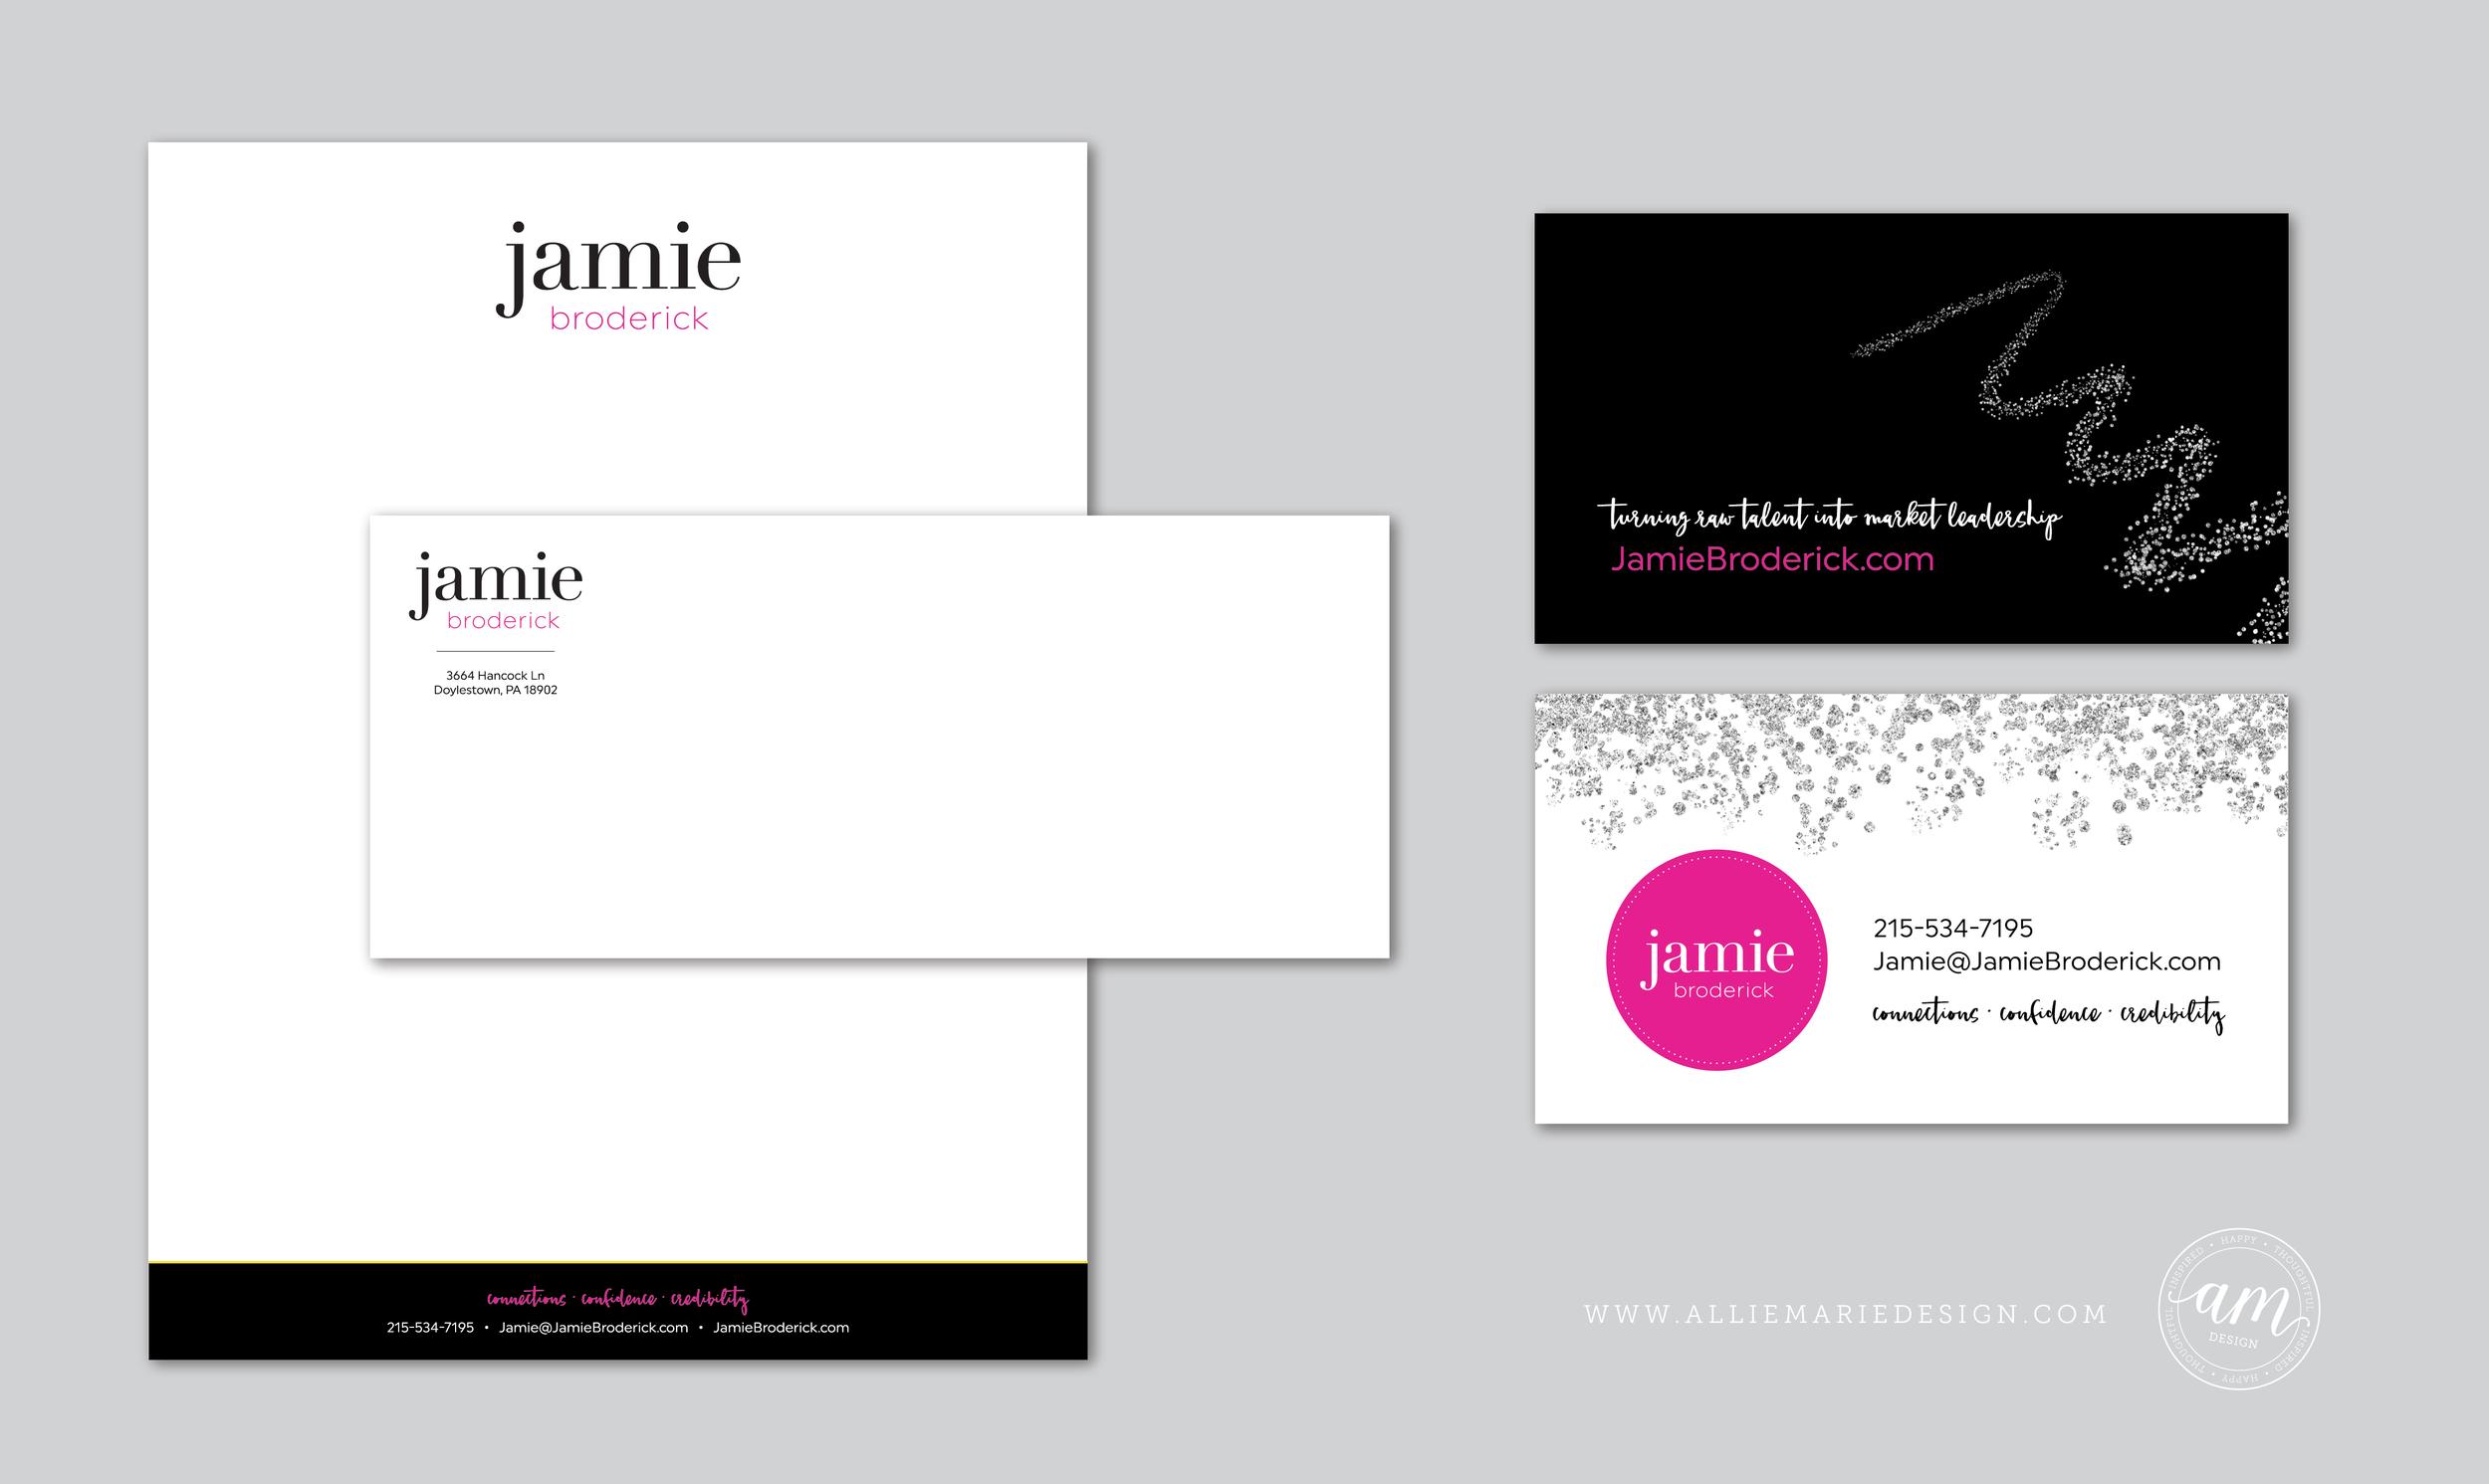 Jamie Broderick Brand Styling by AllieMarie Design | Letterhead ...